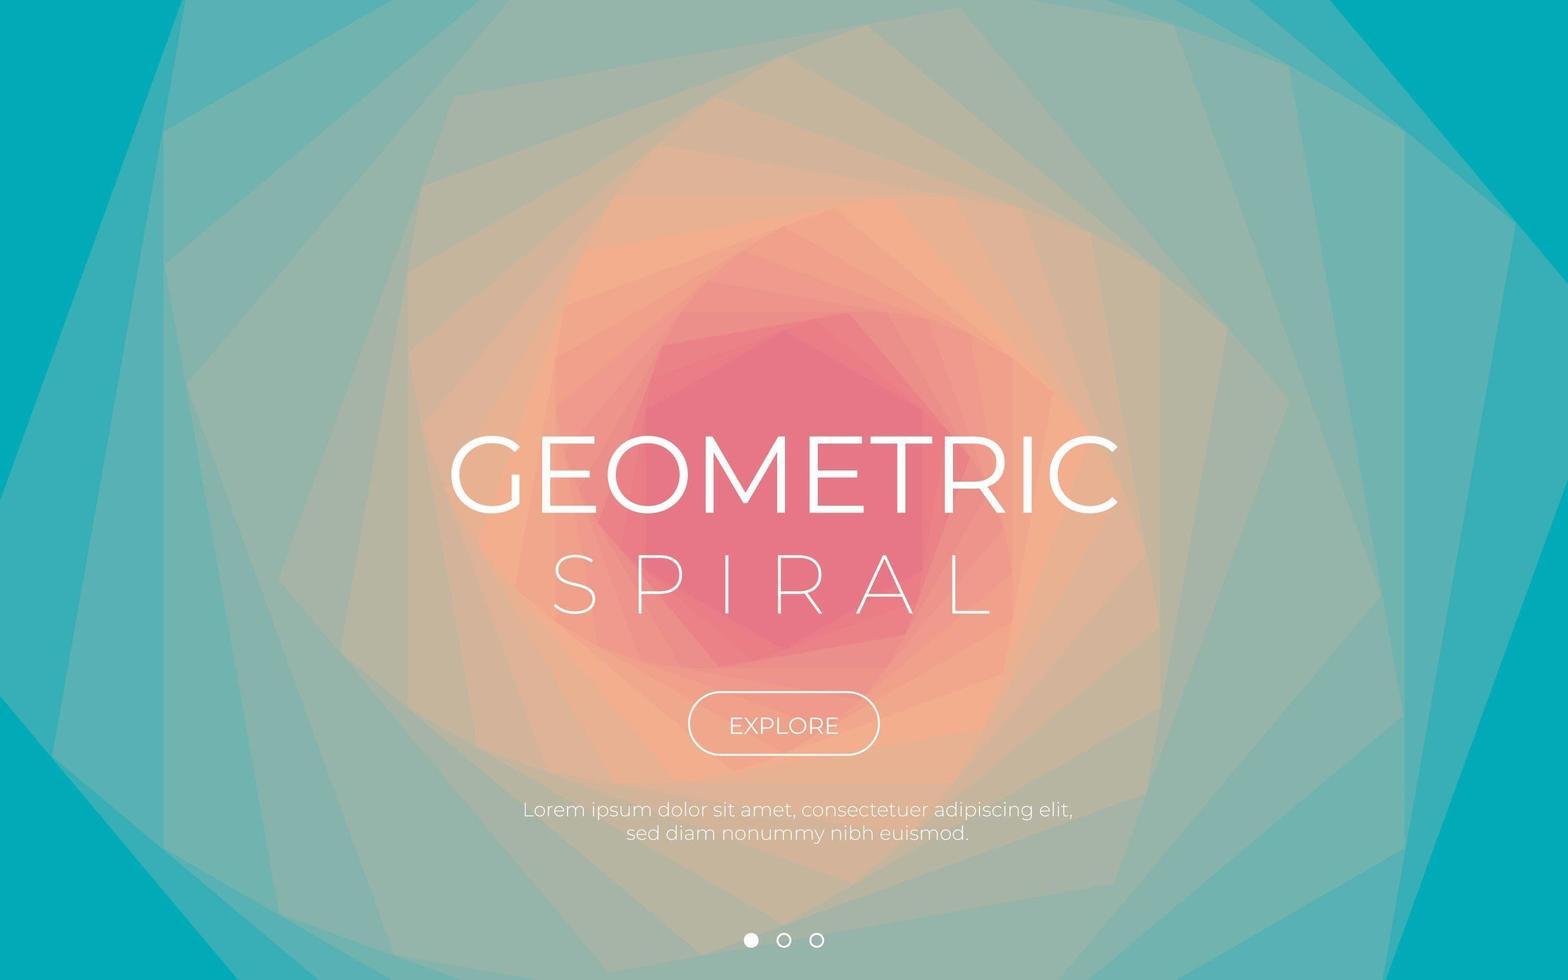 färgglada geometriska spiral bakgrund vektor